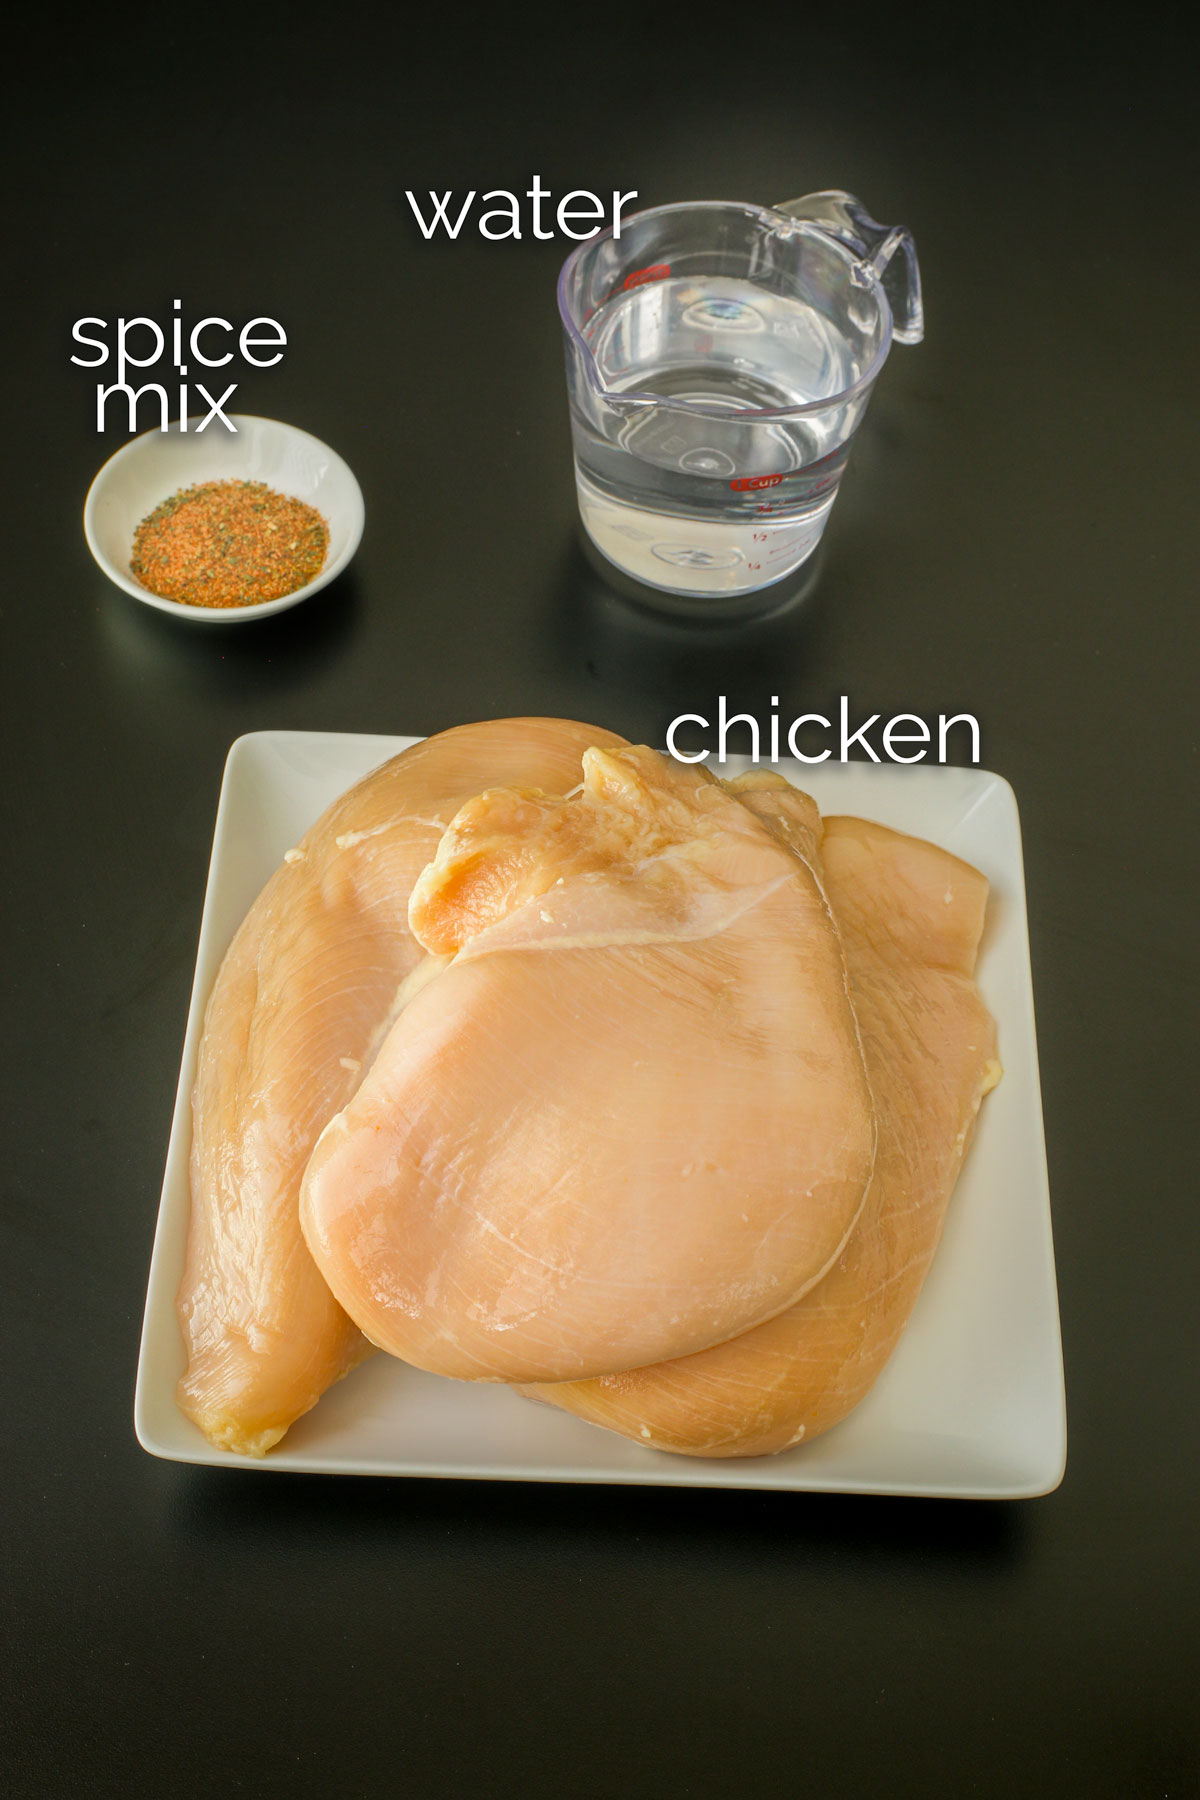 ingredients to make seasoned shredded chicken to make in pressure cooker.